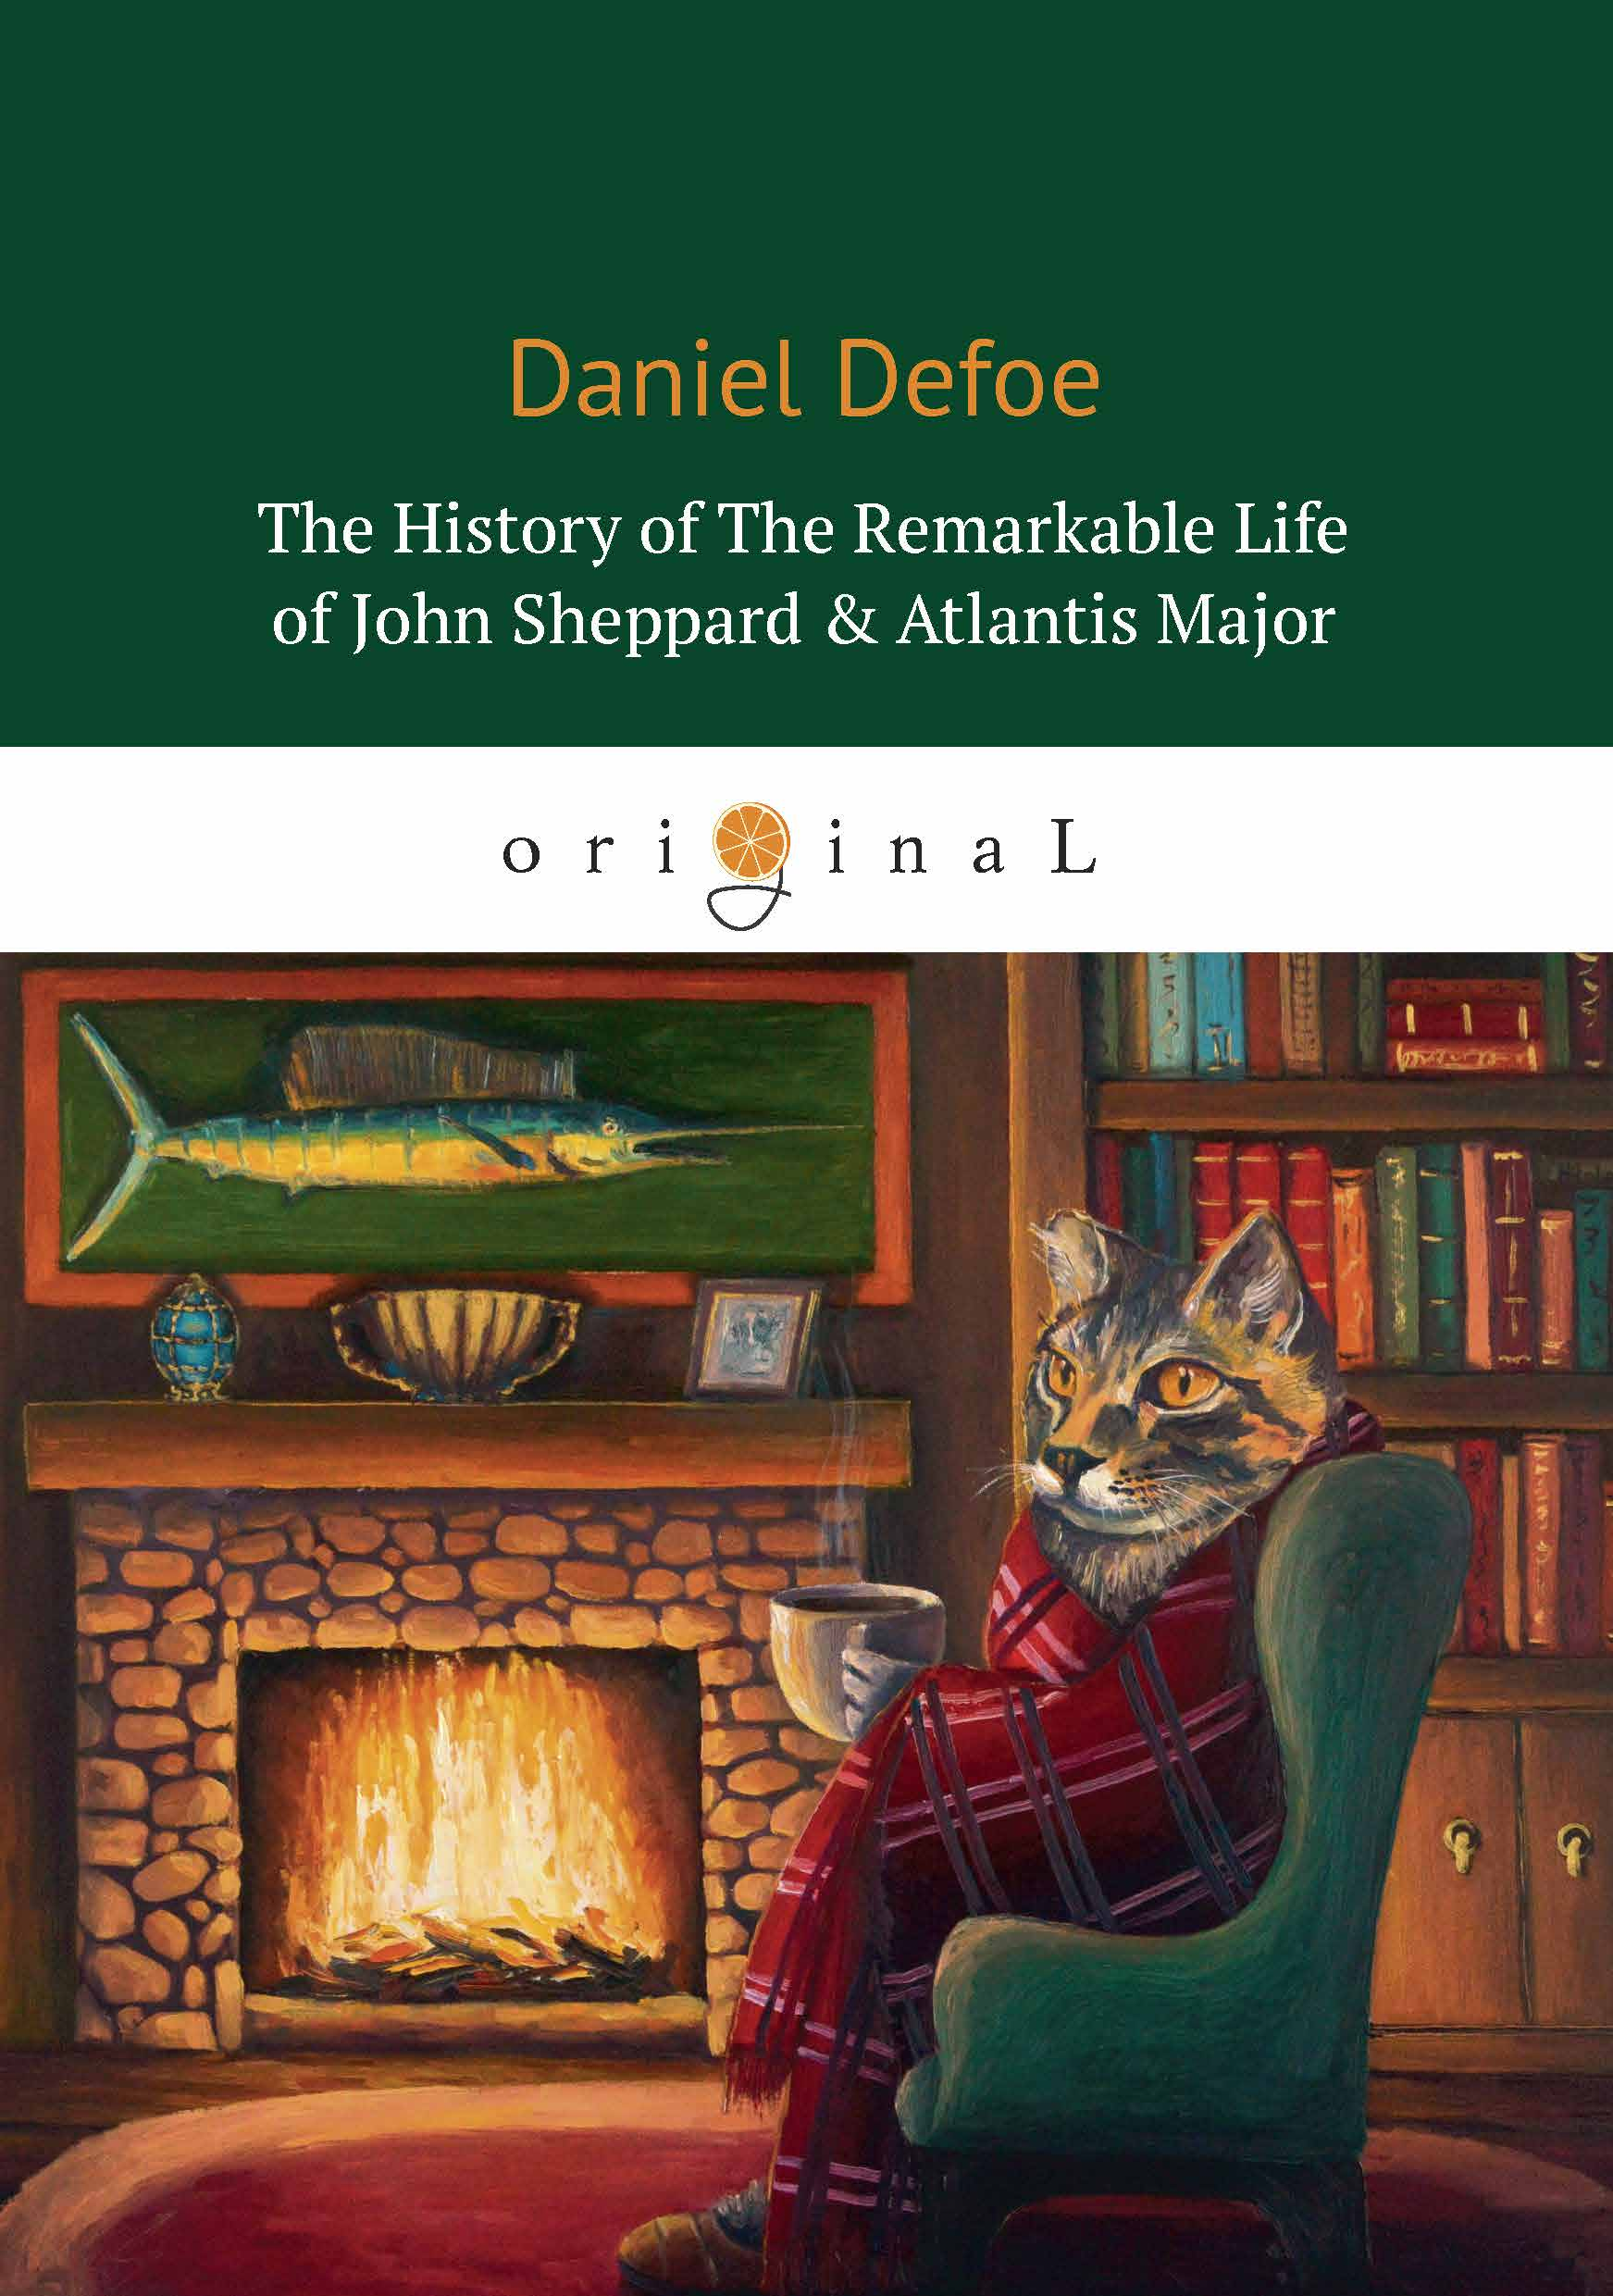 Defoe D. The History of the Remarkable Life of John Sheppard & Atlantis Majo